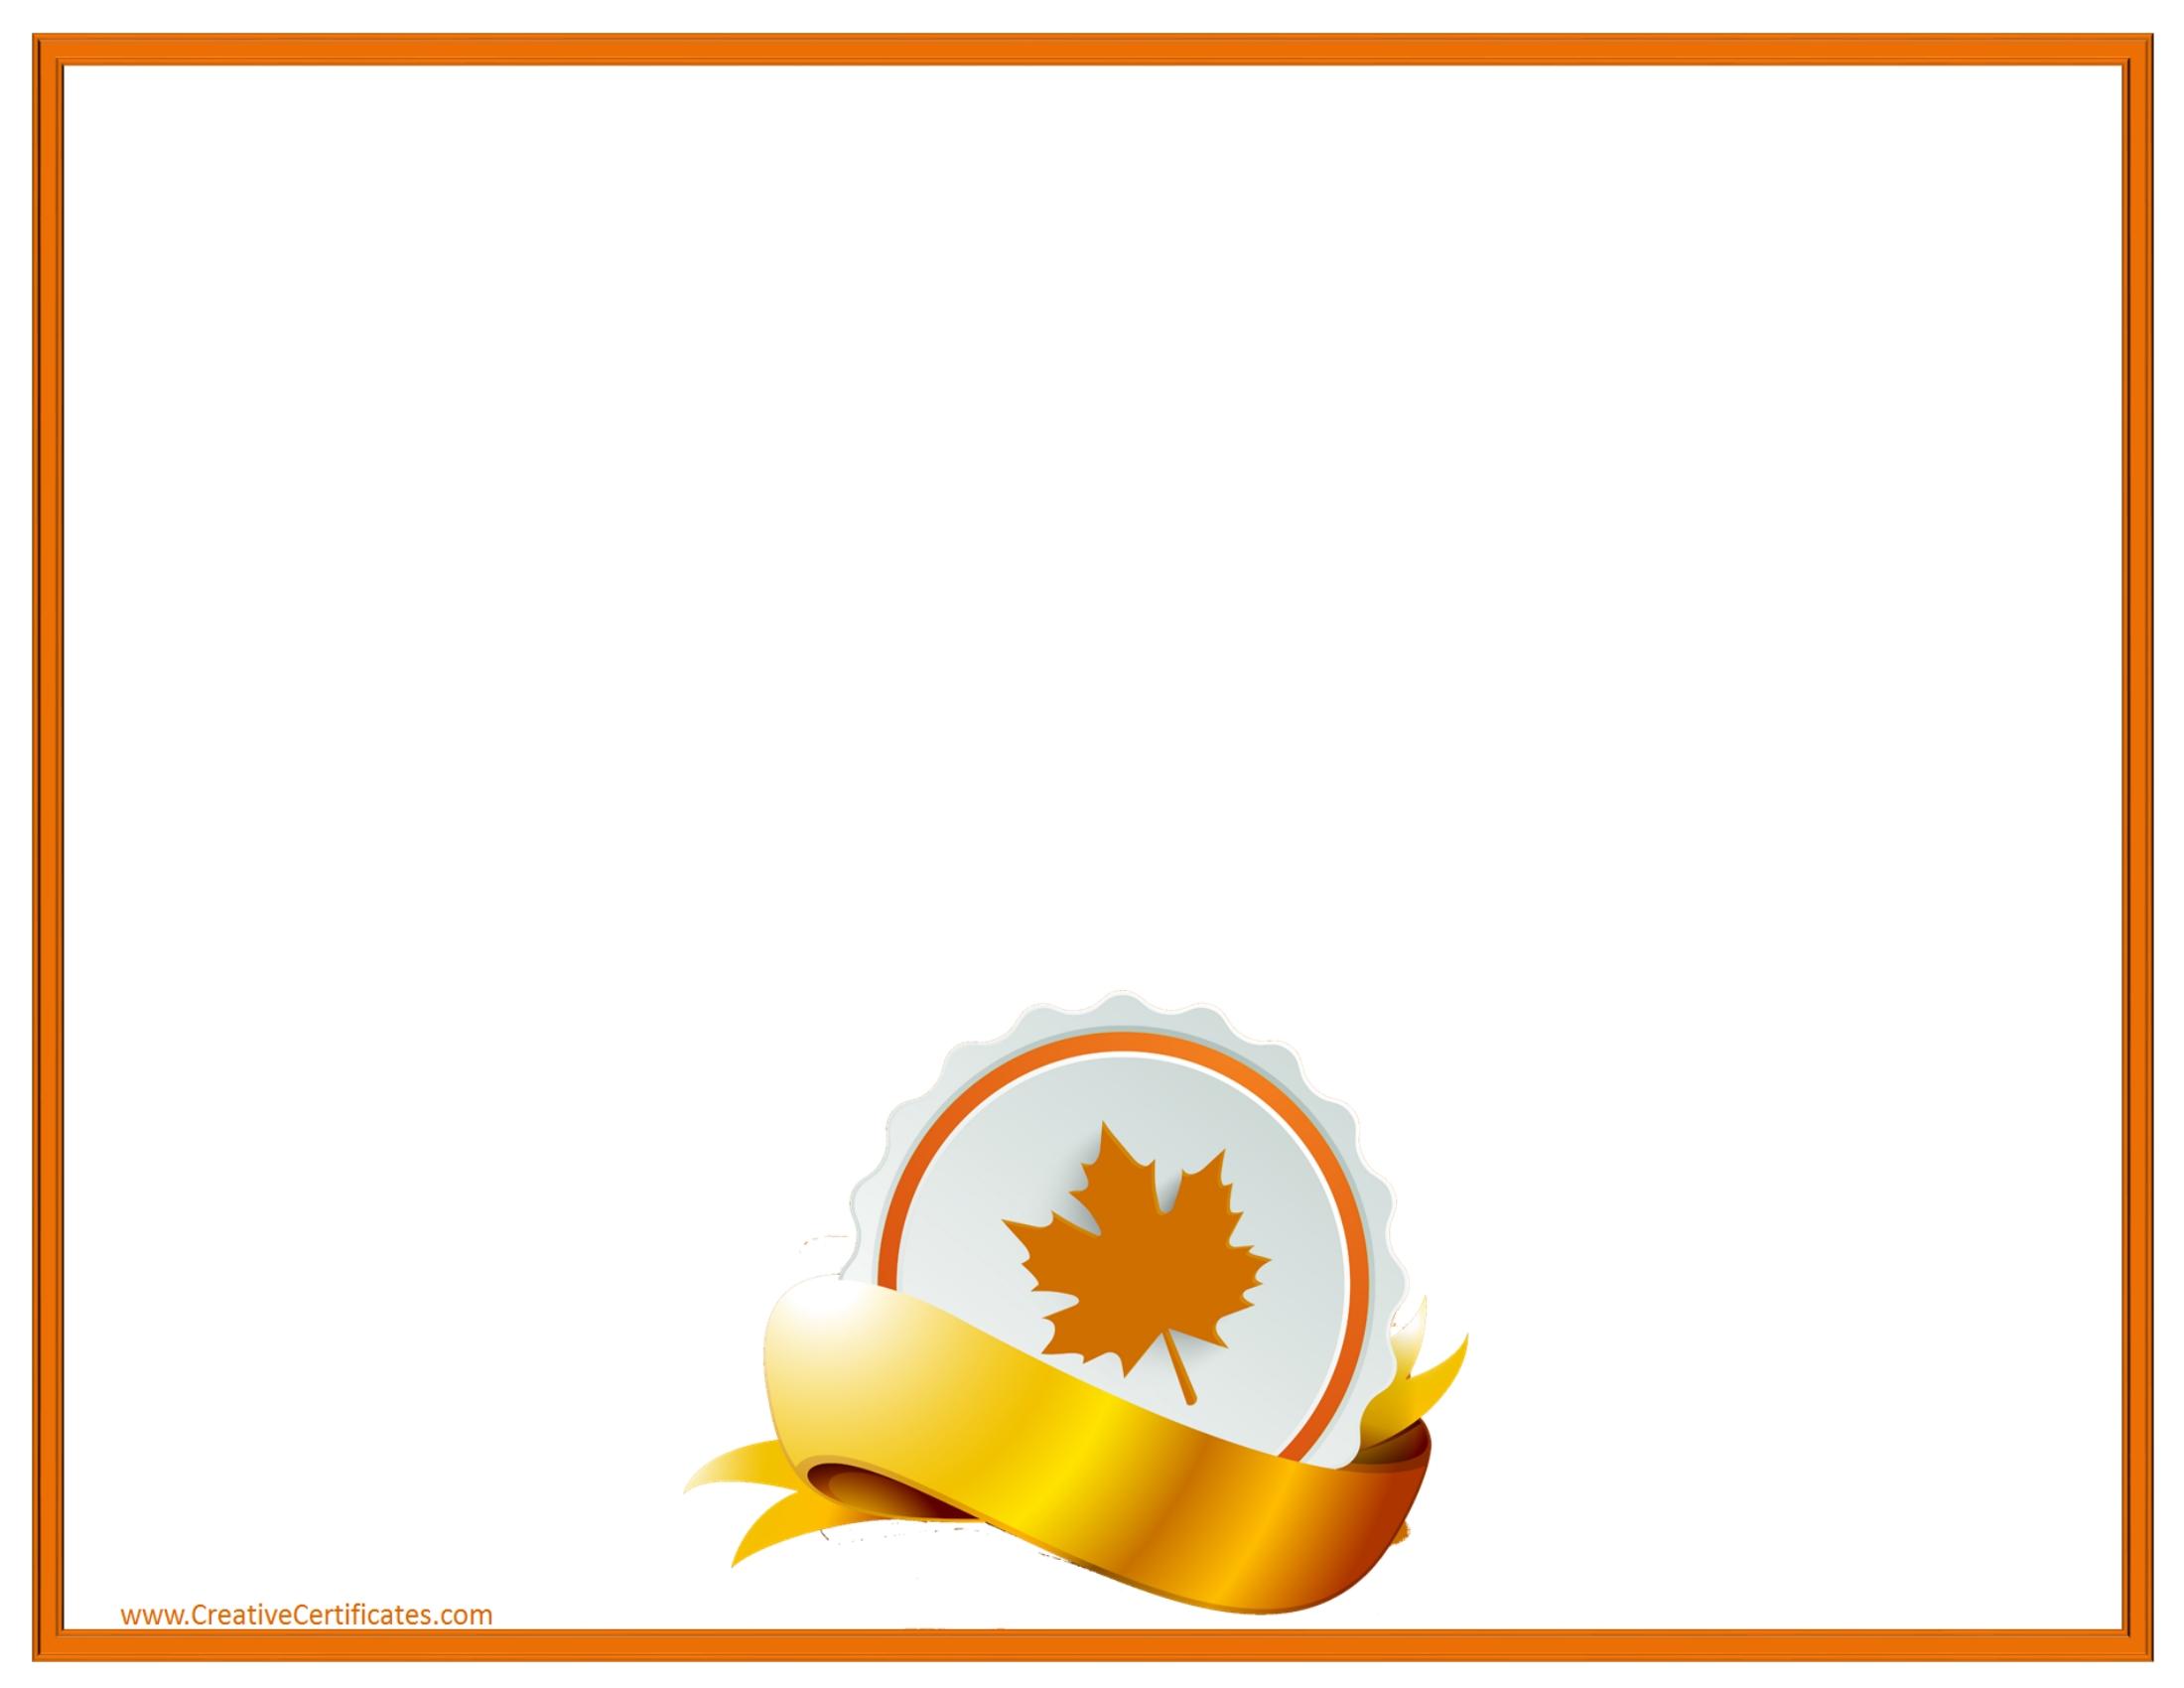 2200x1700 Thanksgiving Border Images Free Thanksgiving Borders 10